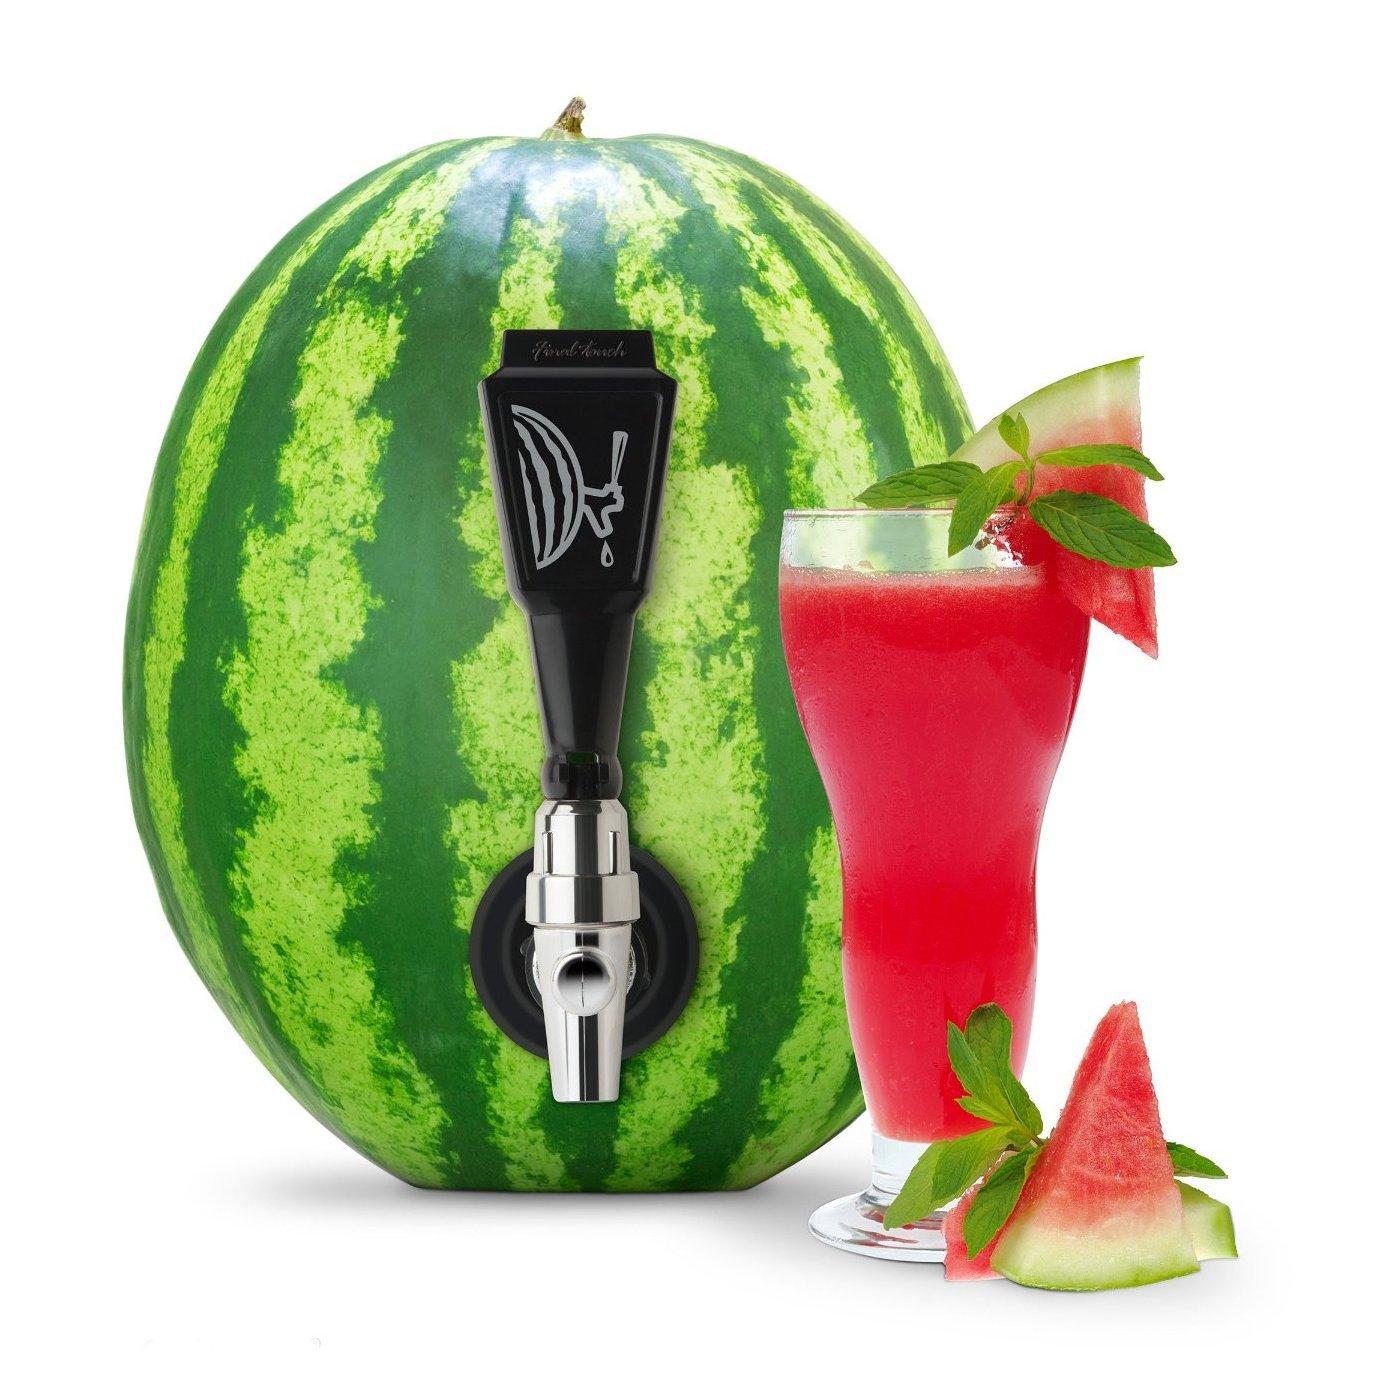 Watermelon Keg Tapping Kit